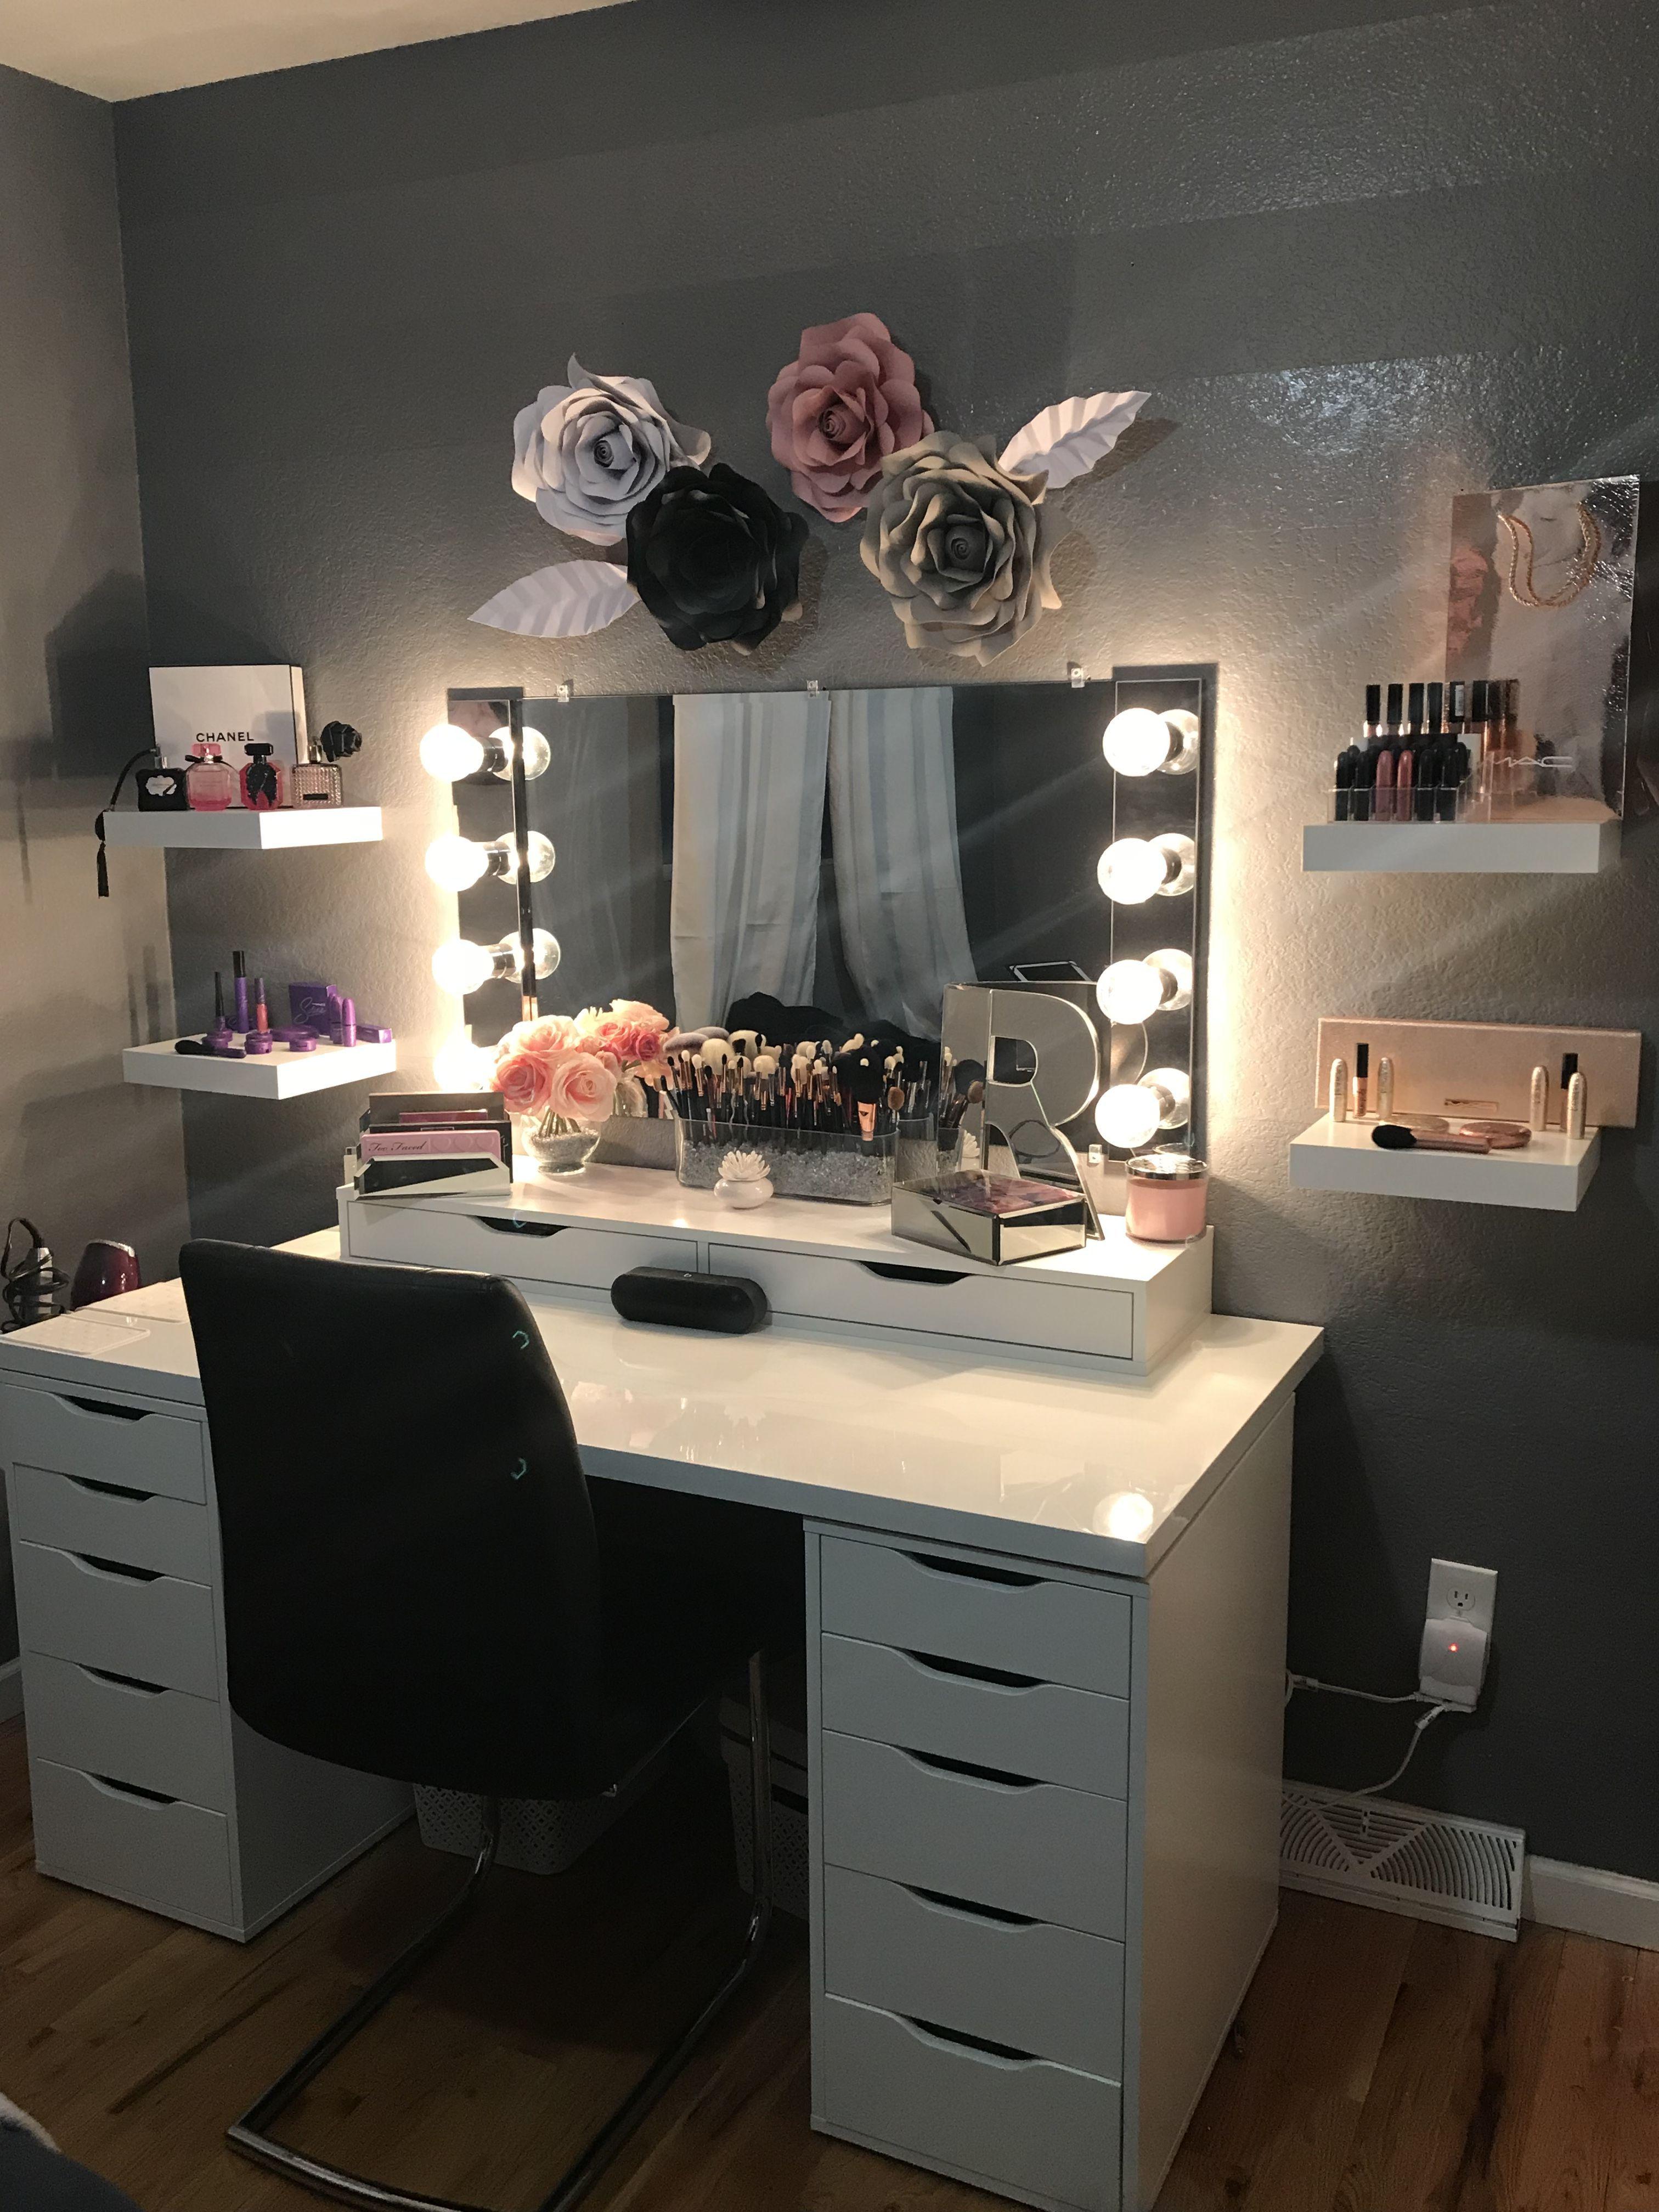 28+ DIY Simple Makeup Room Ideas, Organizer, Storage and ... on Makeup Room Design  id=41698